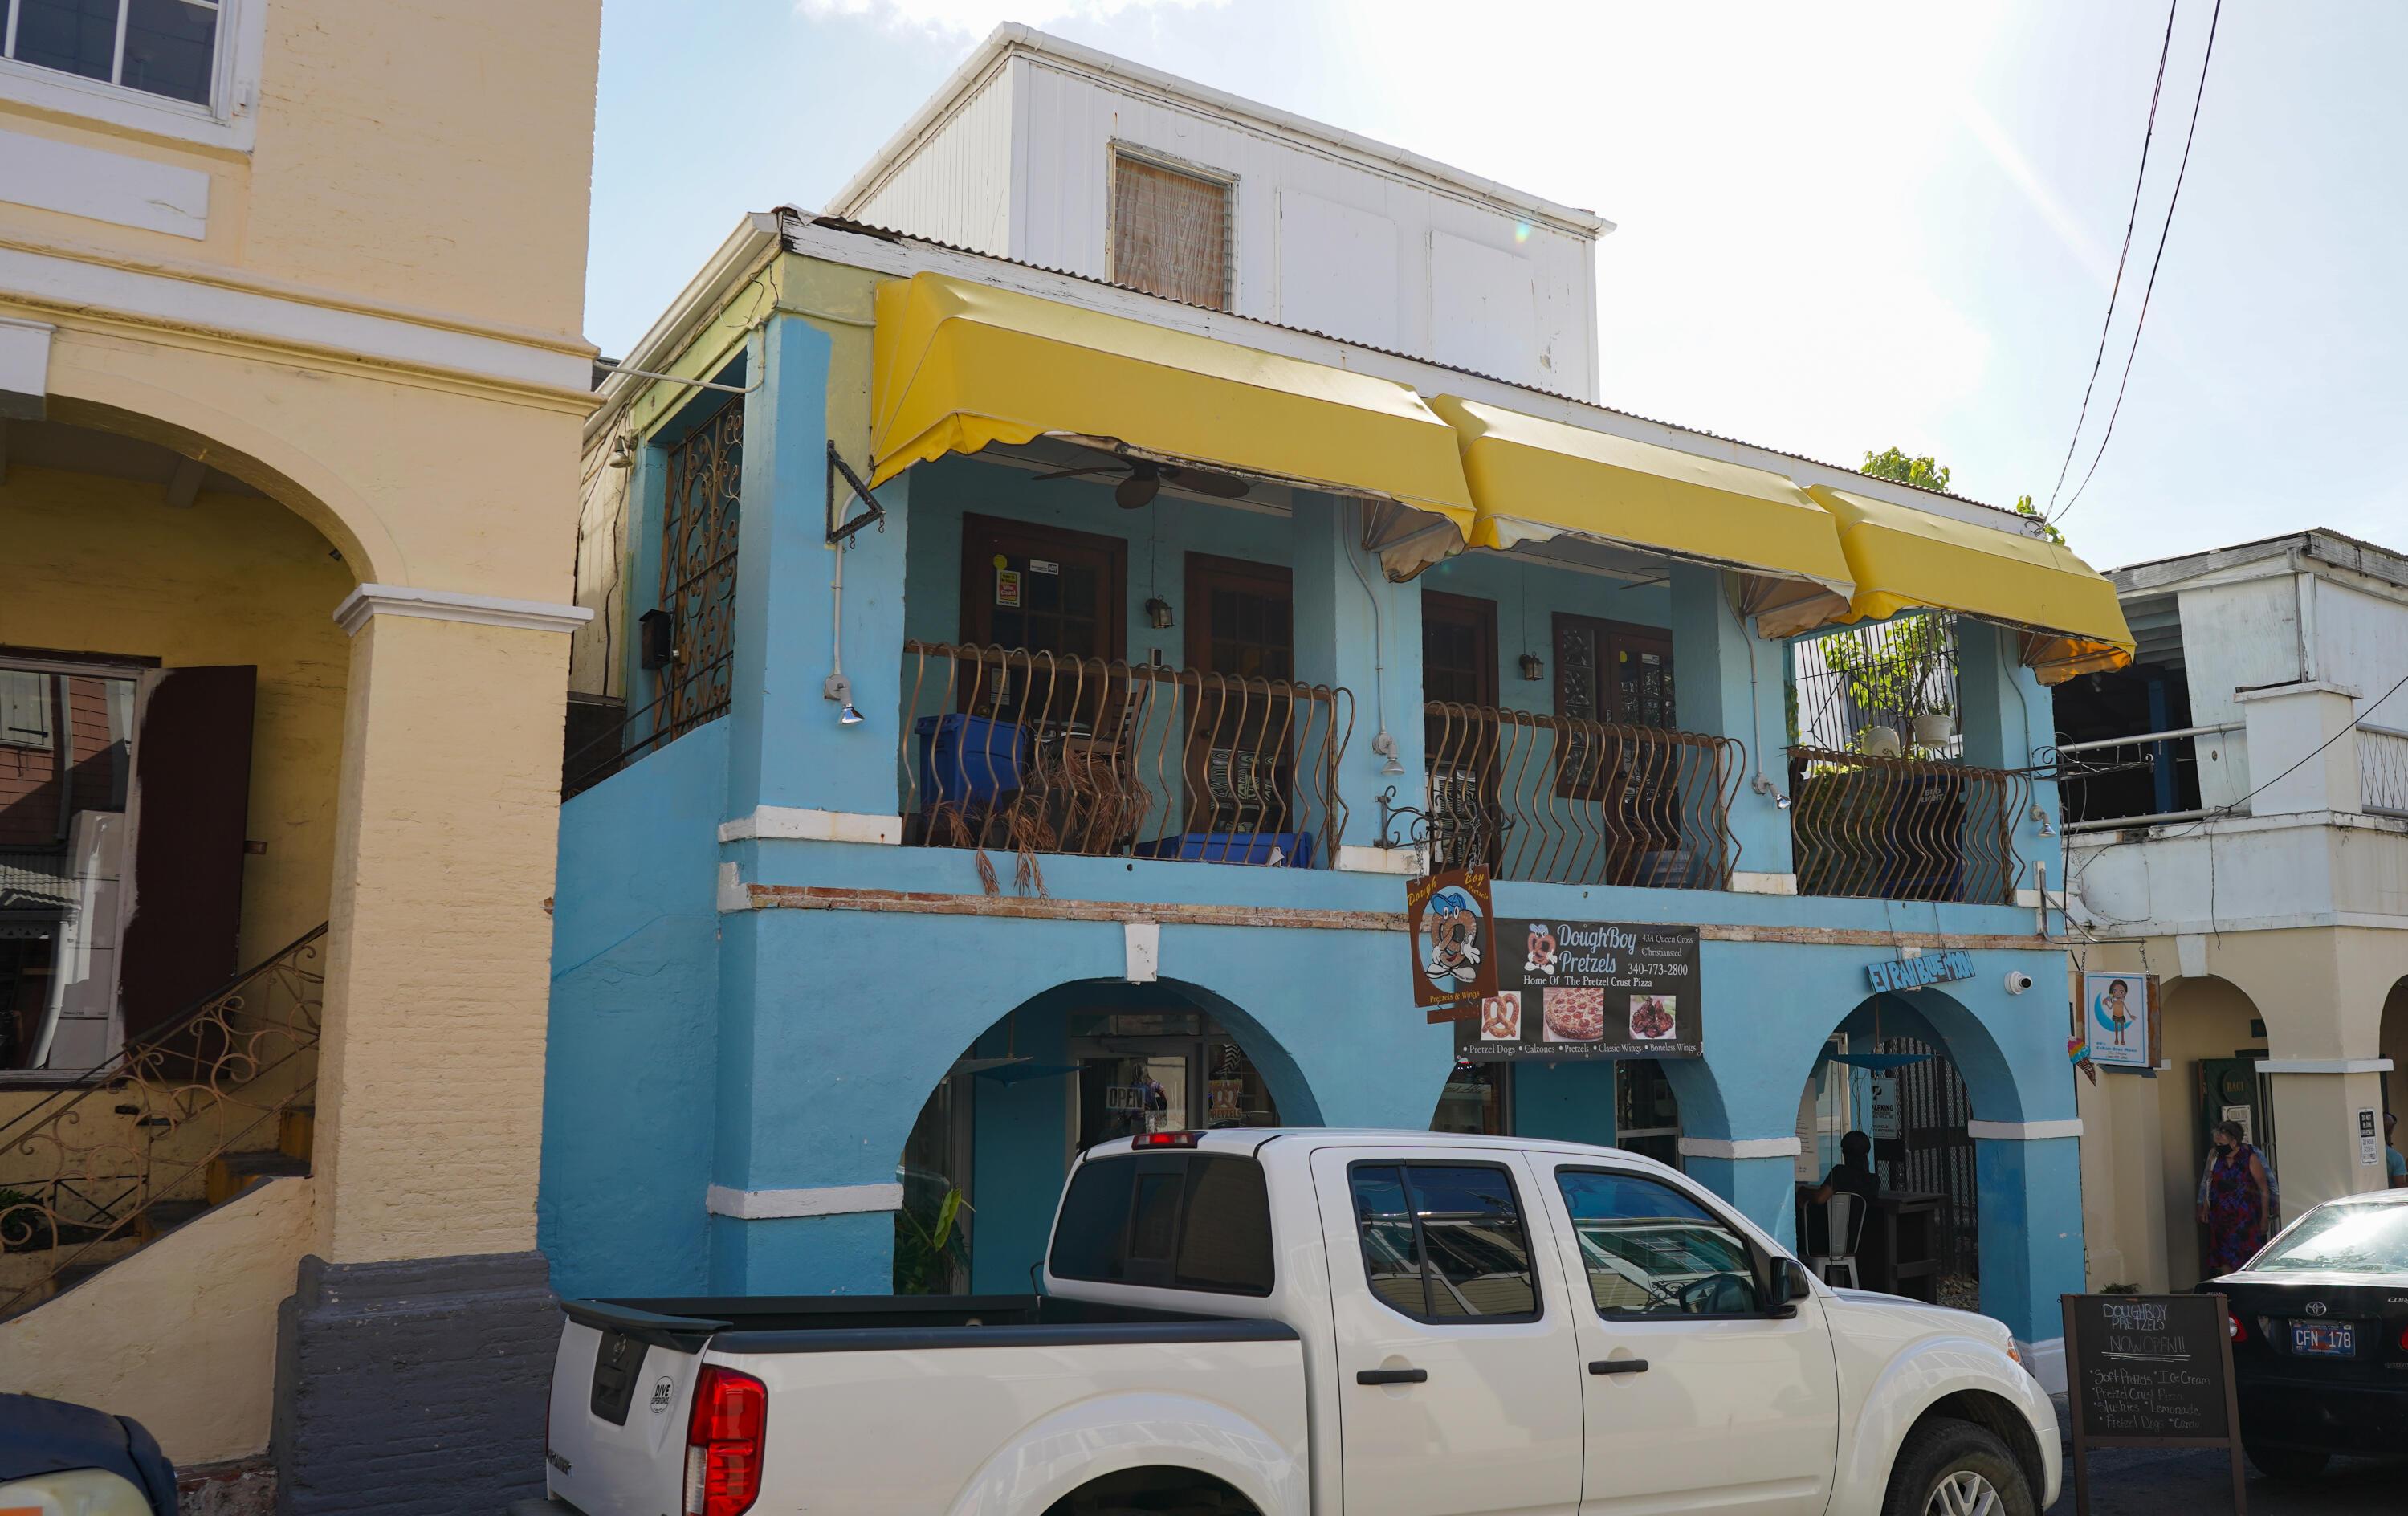 RE/MAX real estate, US Virgin Islands, Queens Estate, Price Reduced  Commercial  Queen Cross CH